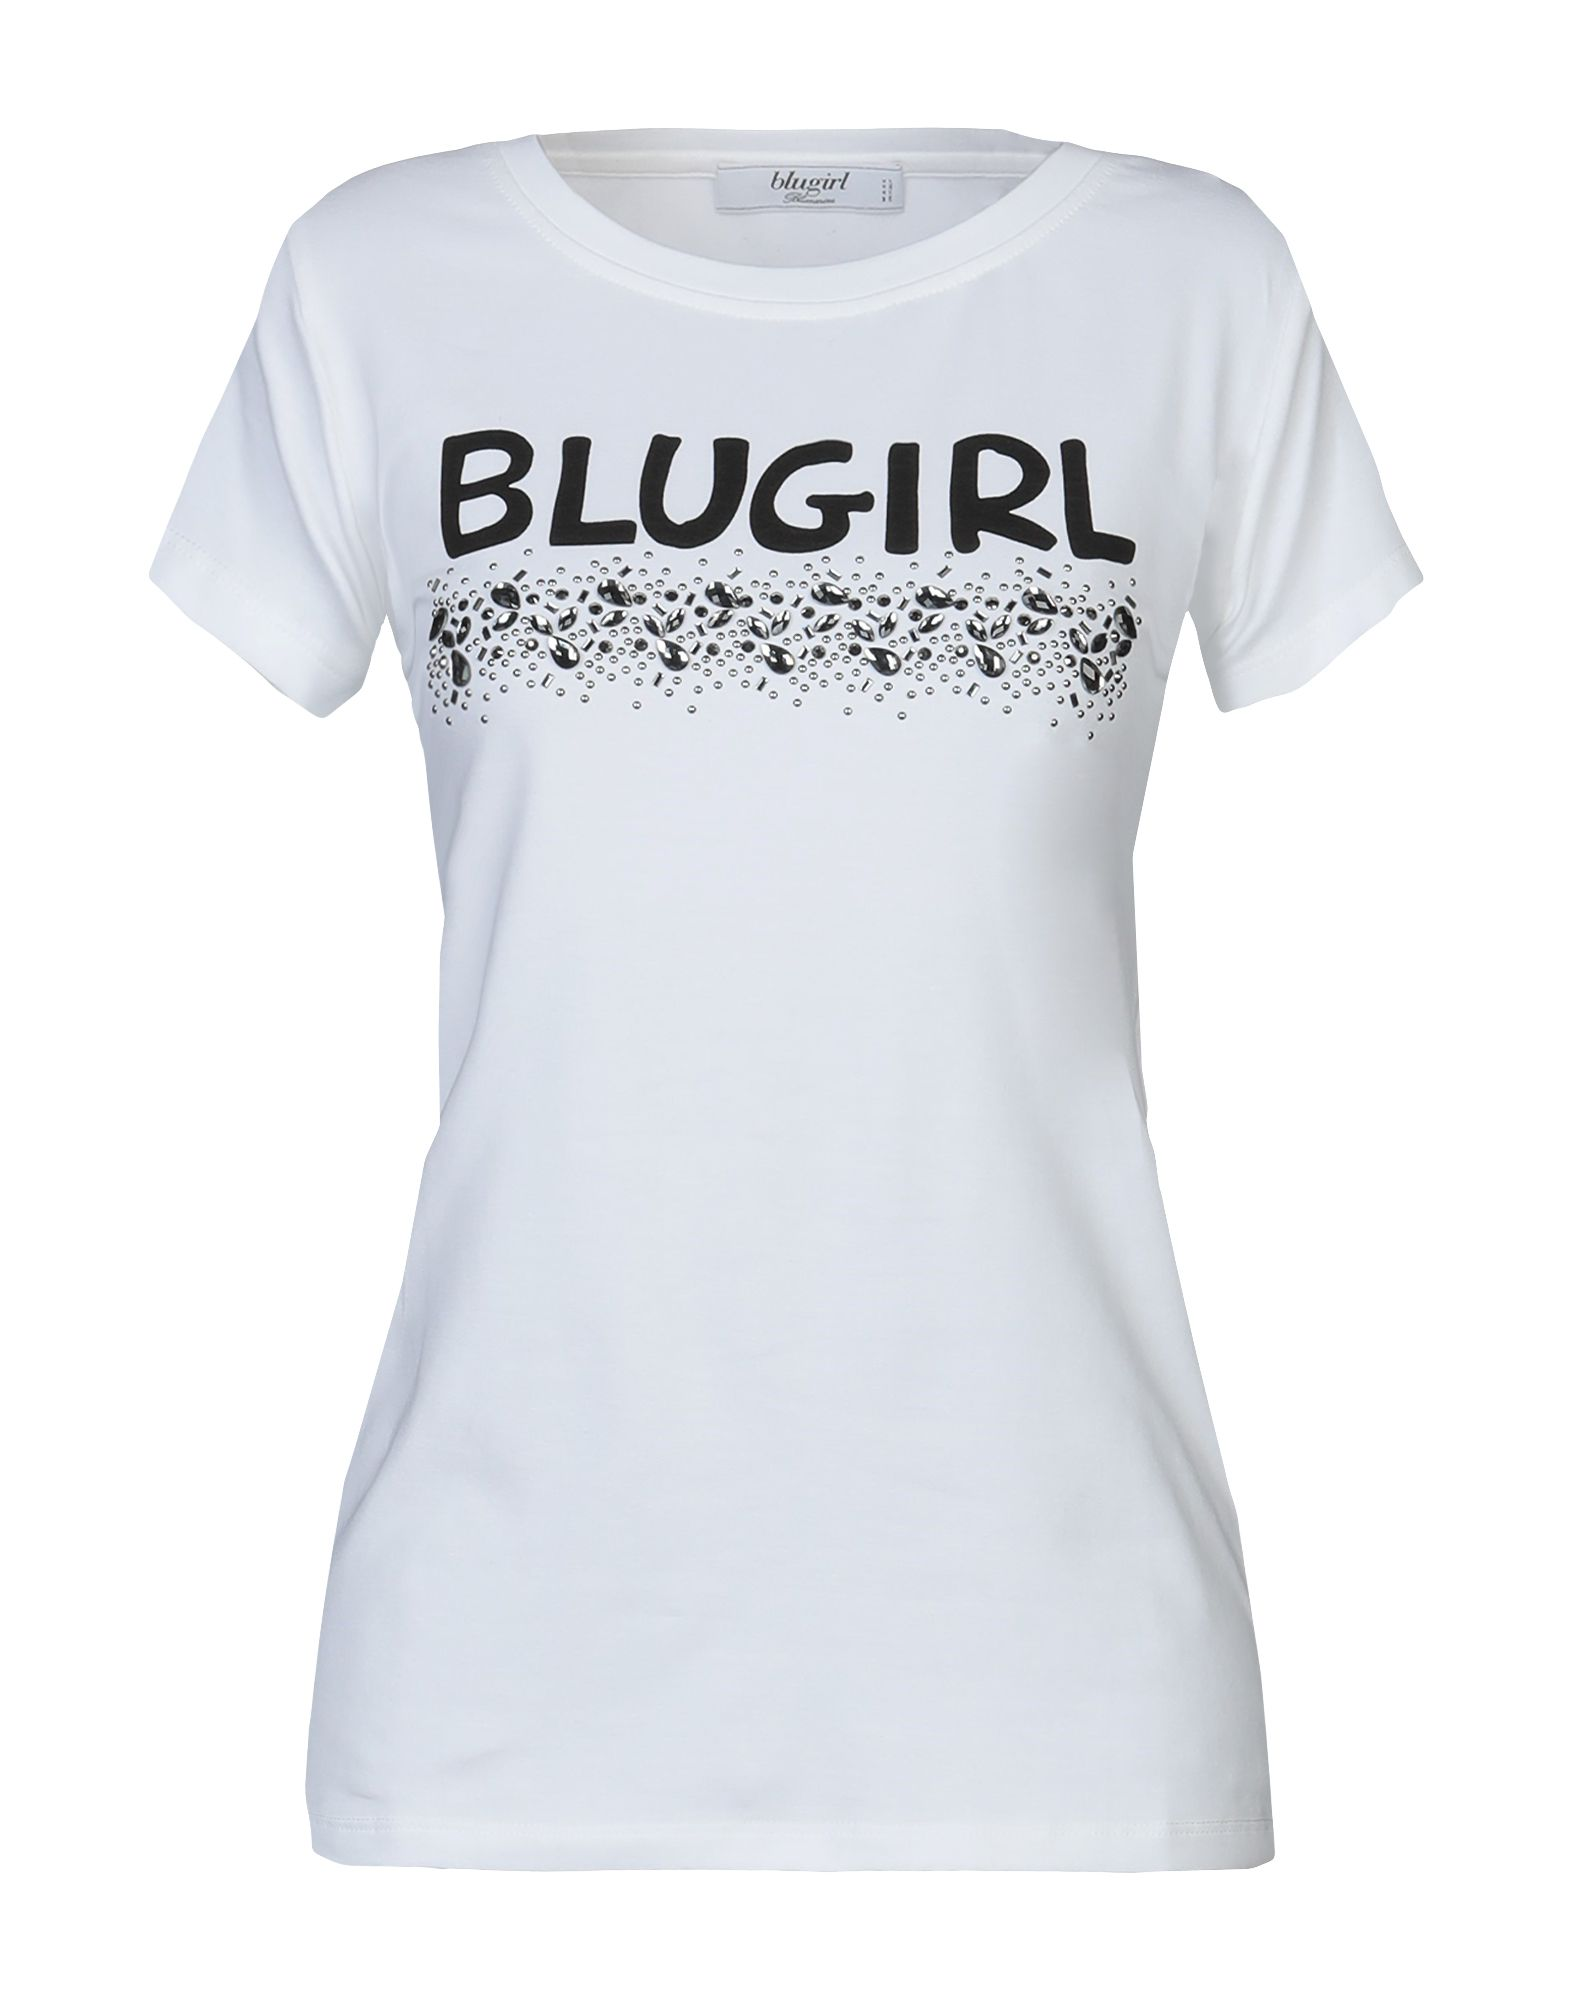 T-Shirt Blaugirl Blaumarine damen - 12288832SR